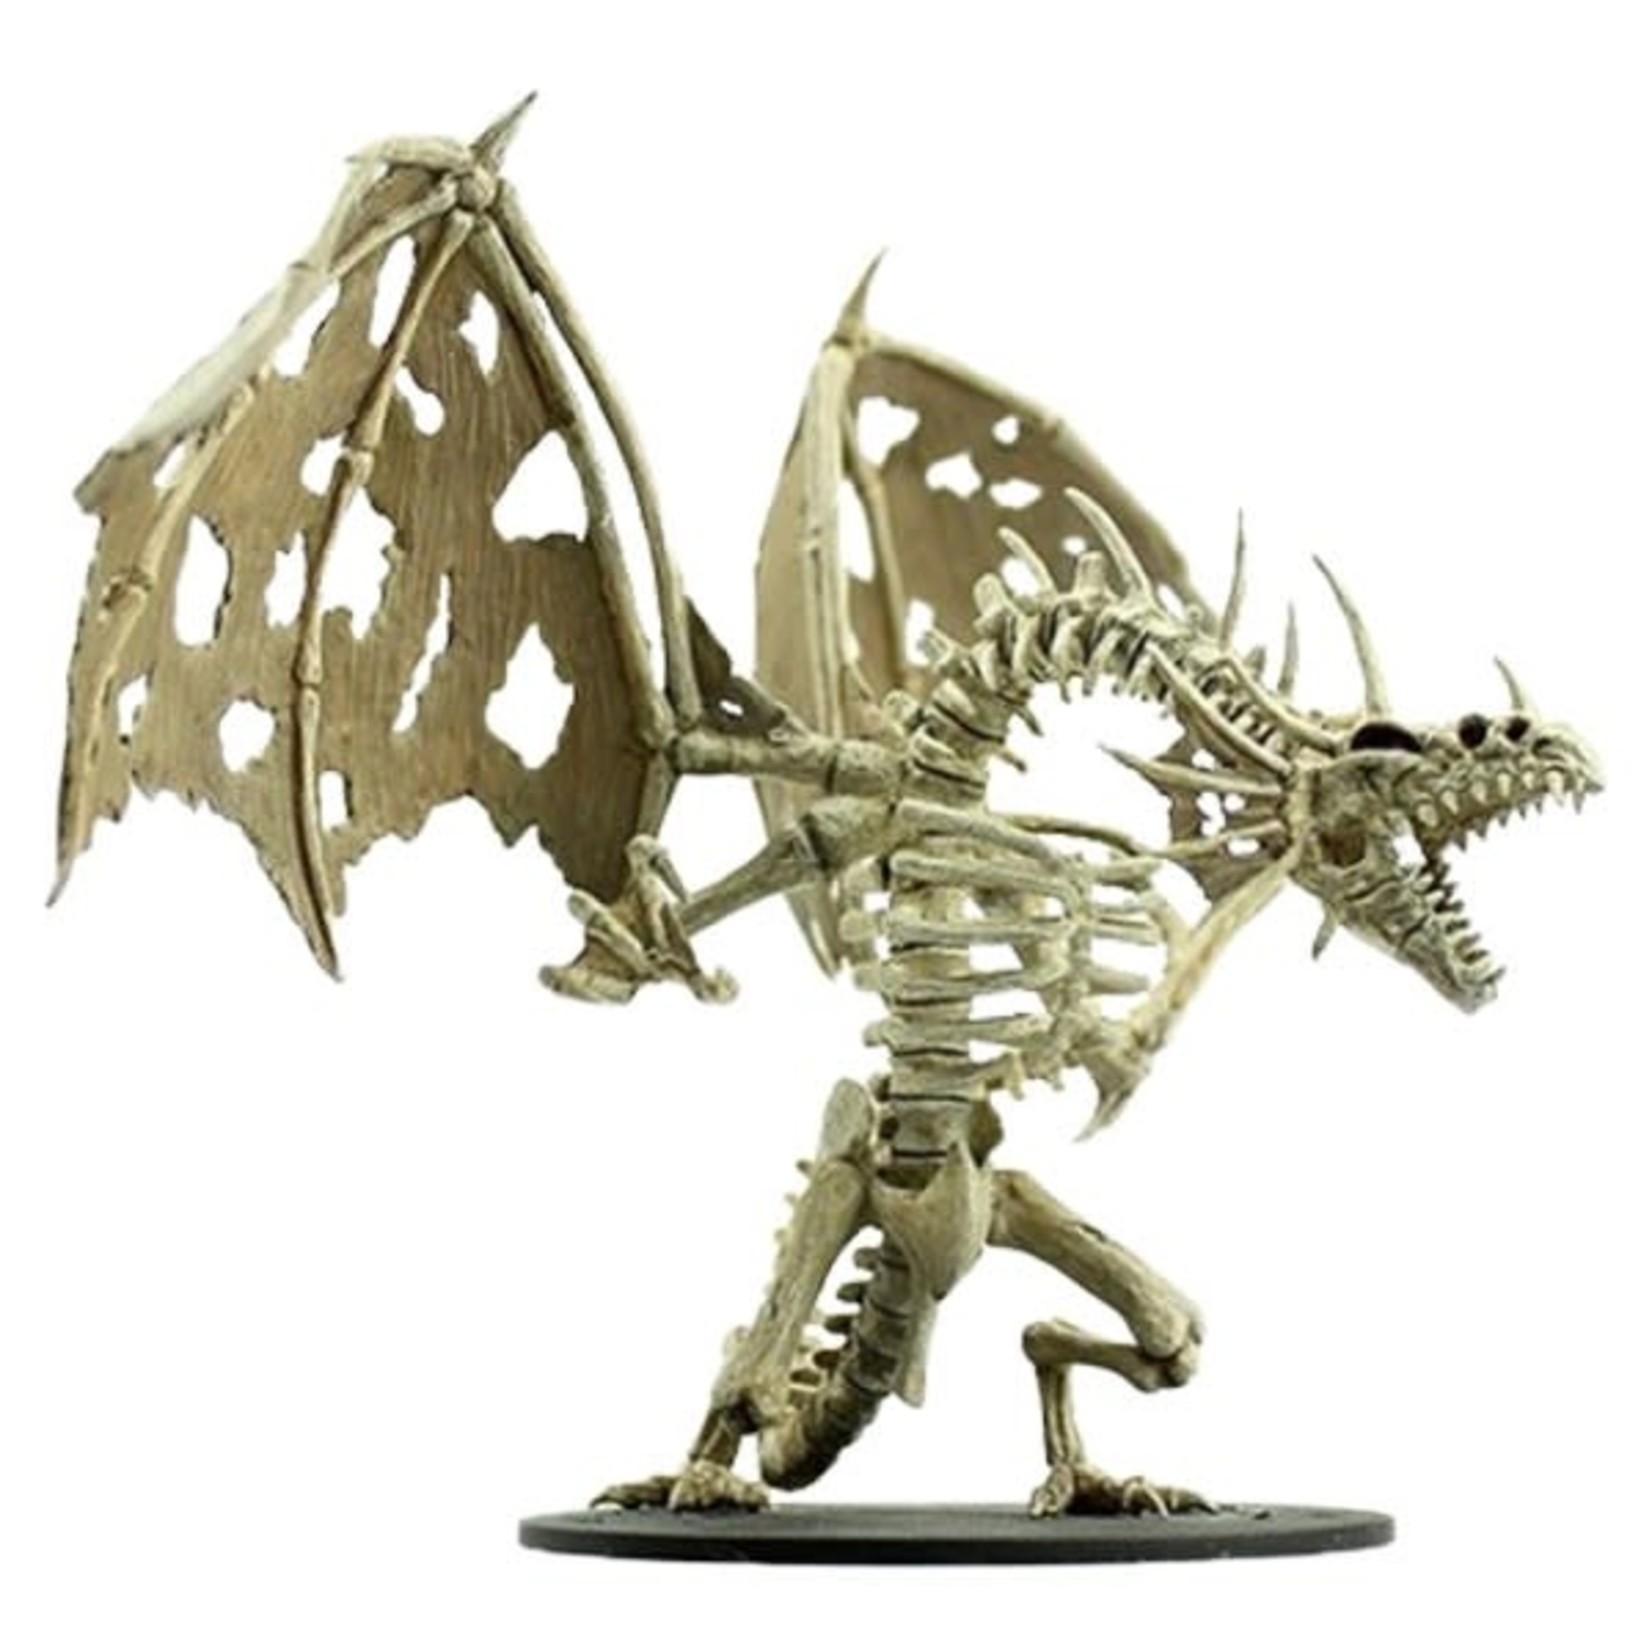 WizKids Pathfinder Minis (unpainted): Gargantuan Skeletal Dragon Wave 11, 90039